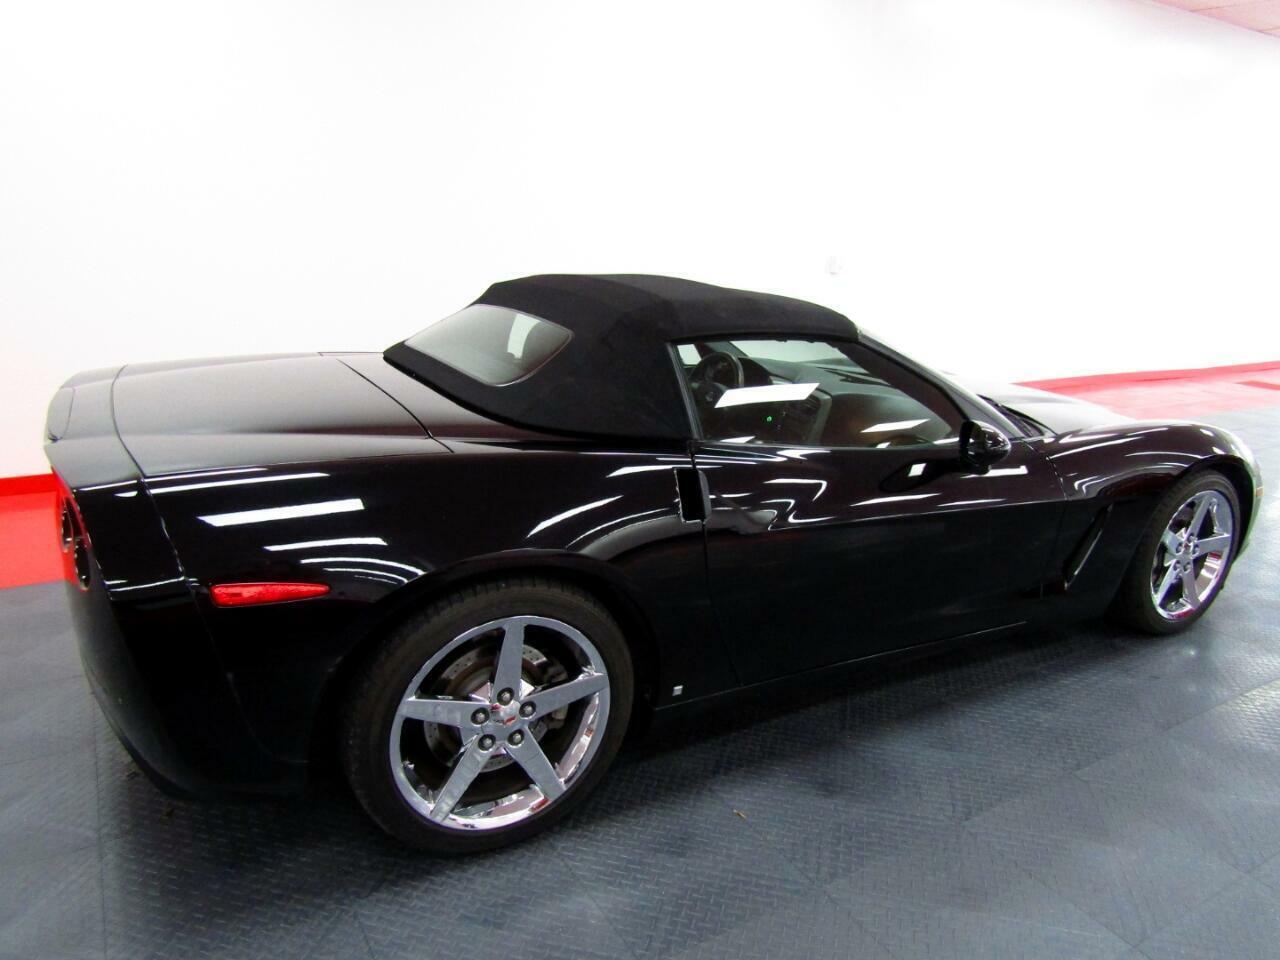 2007 Black Chevrolet Corvette Convertible    C6 Corvette Photo 2